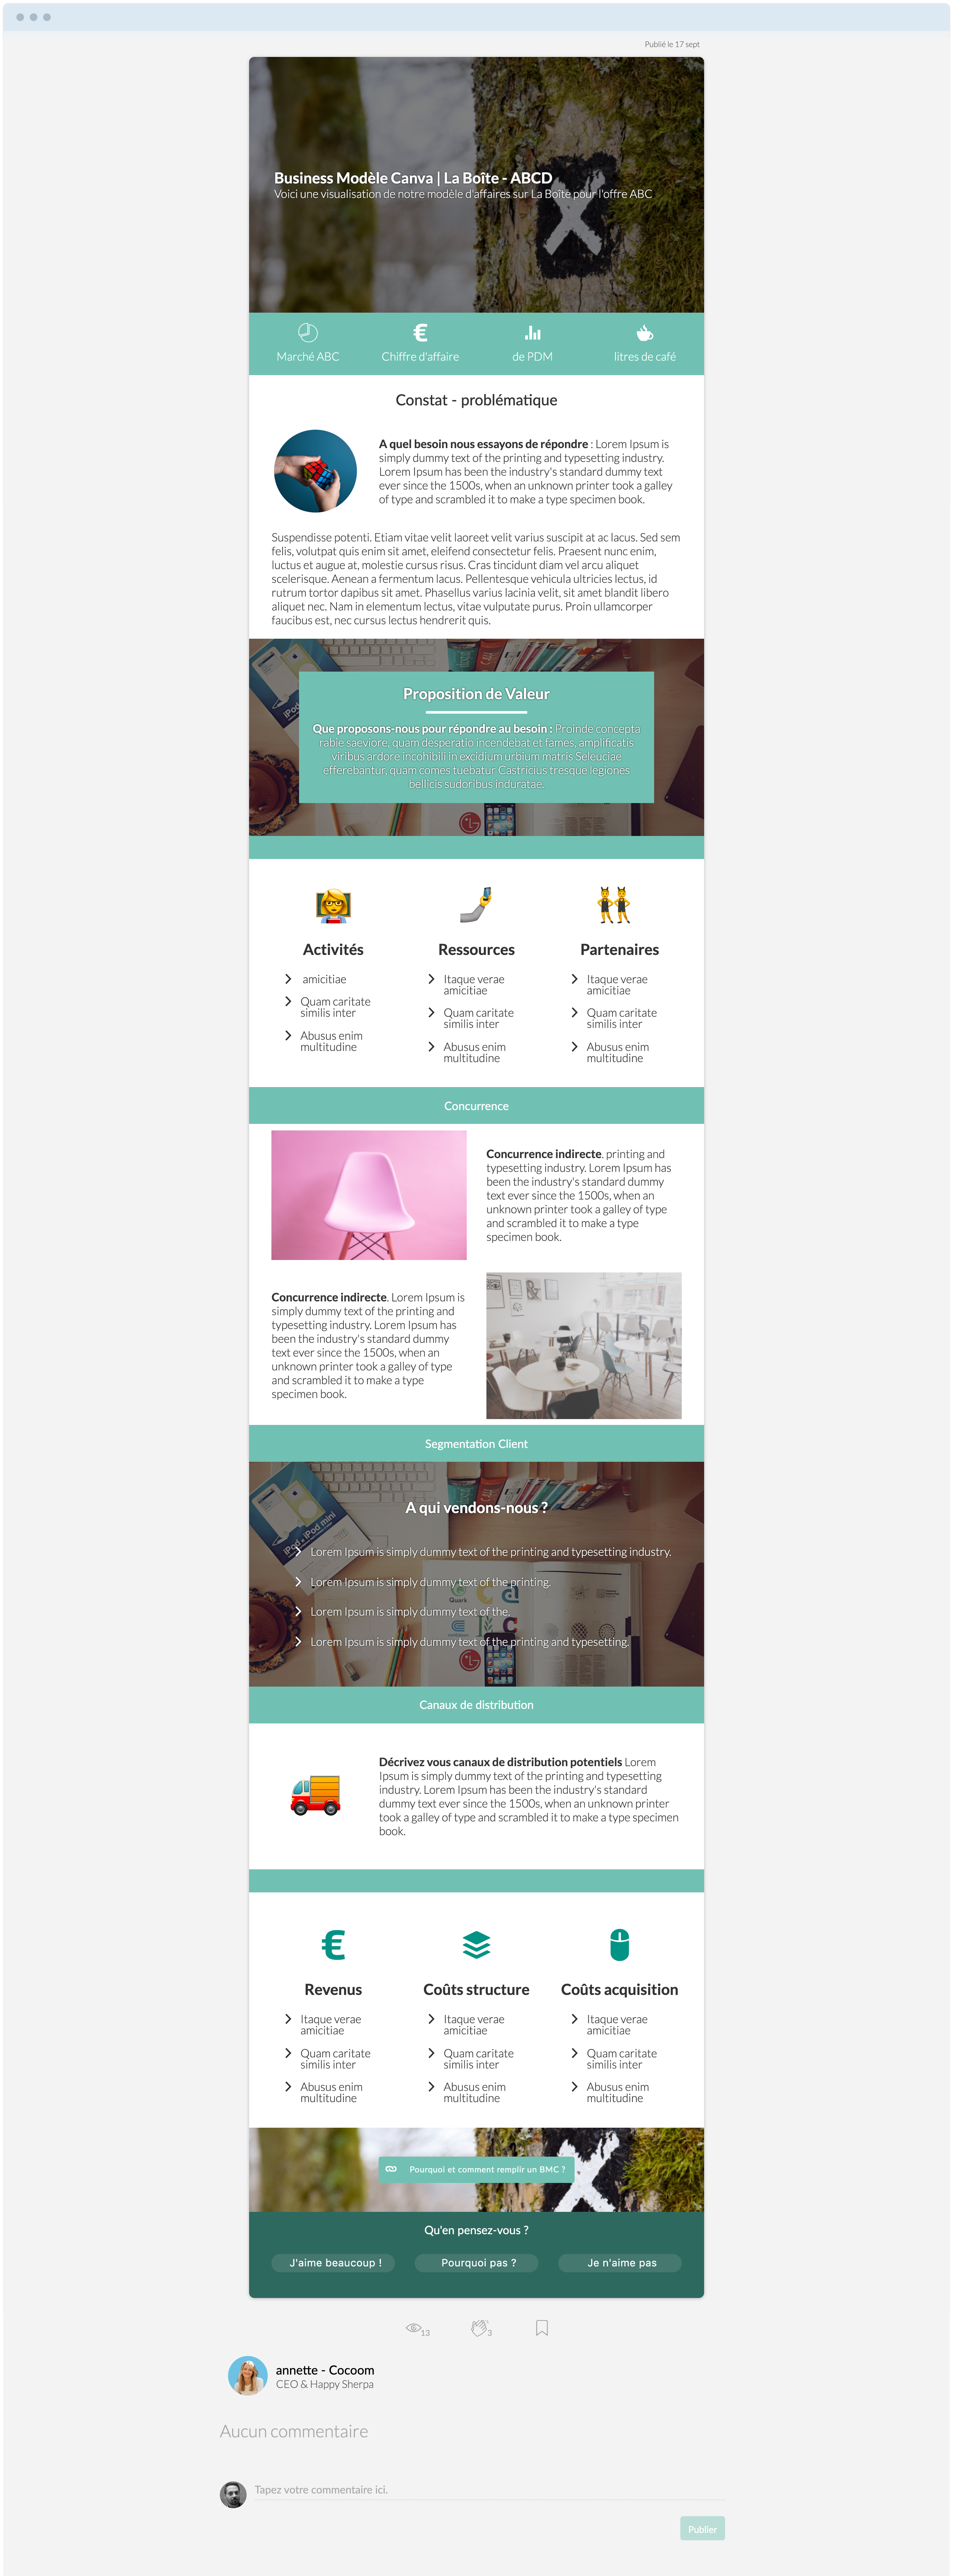 templates & templates write a business canvas